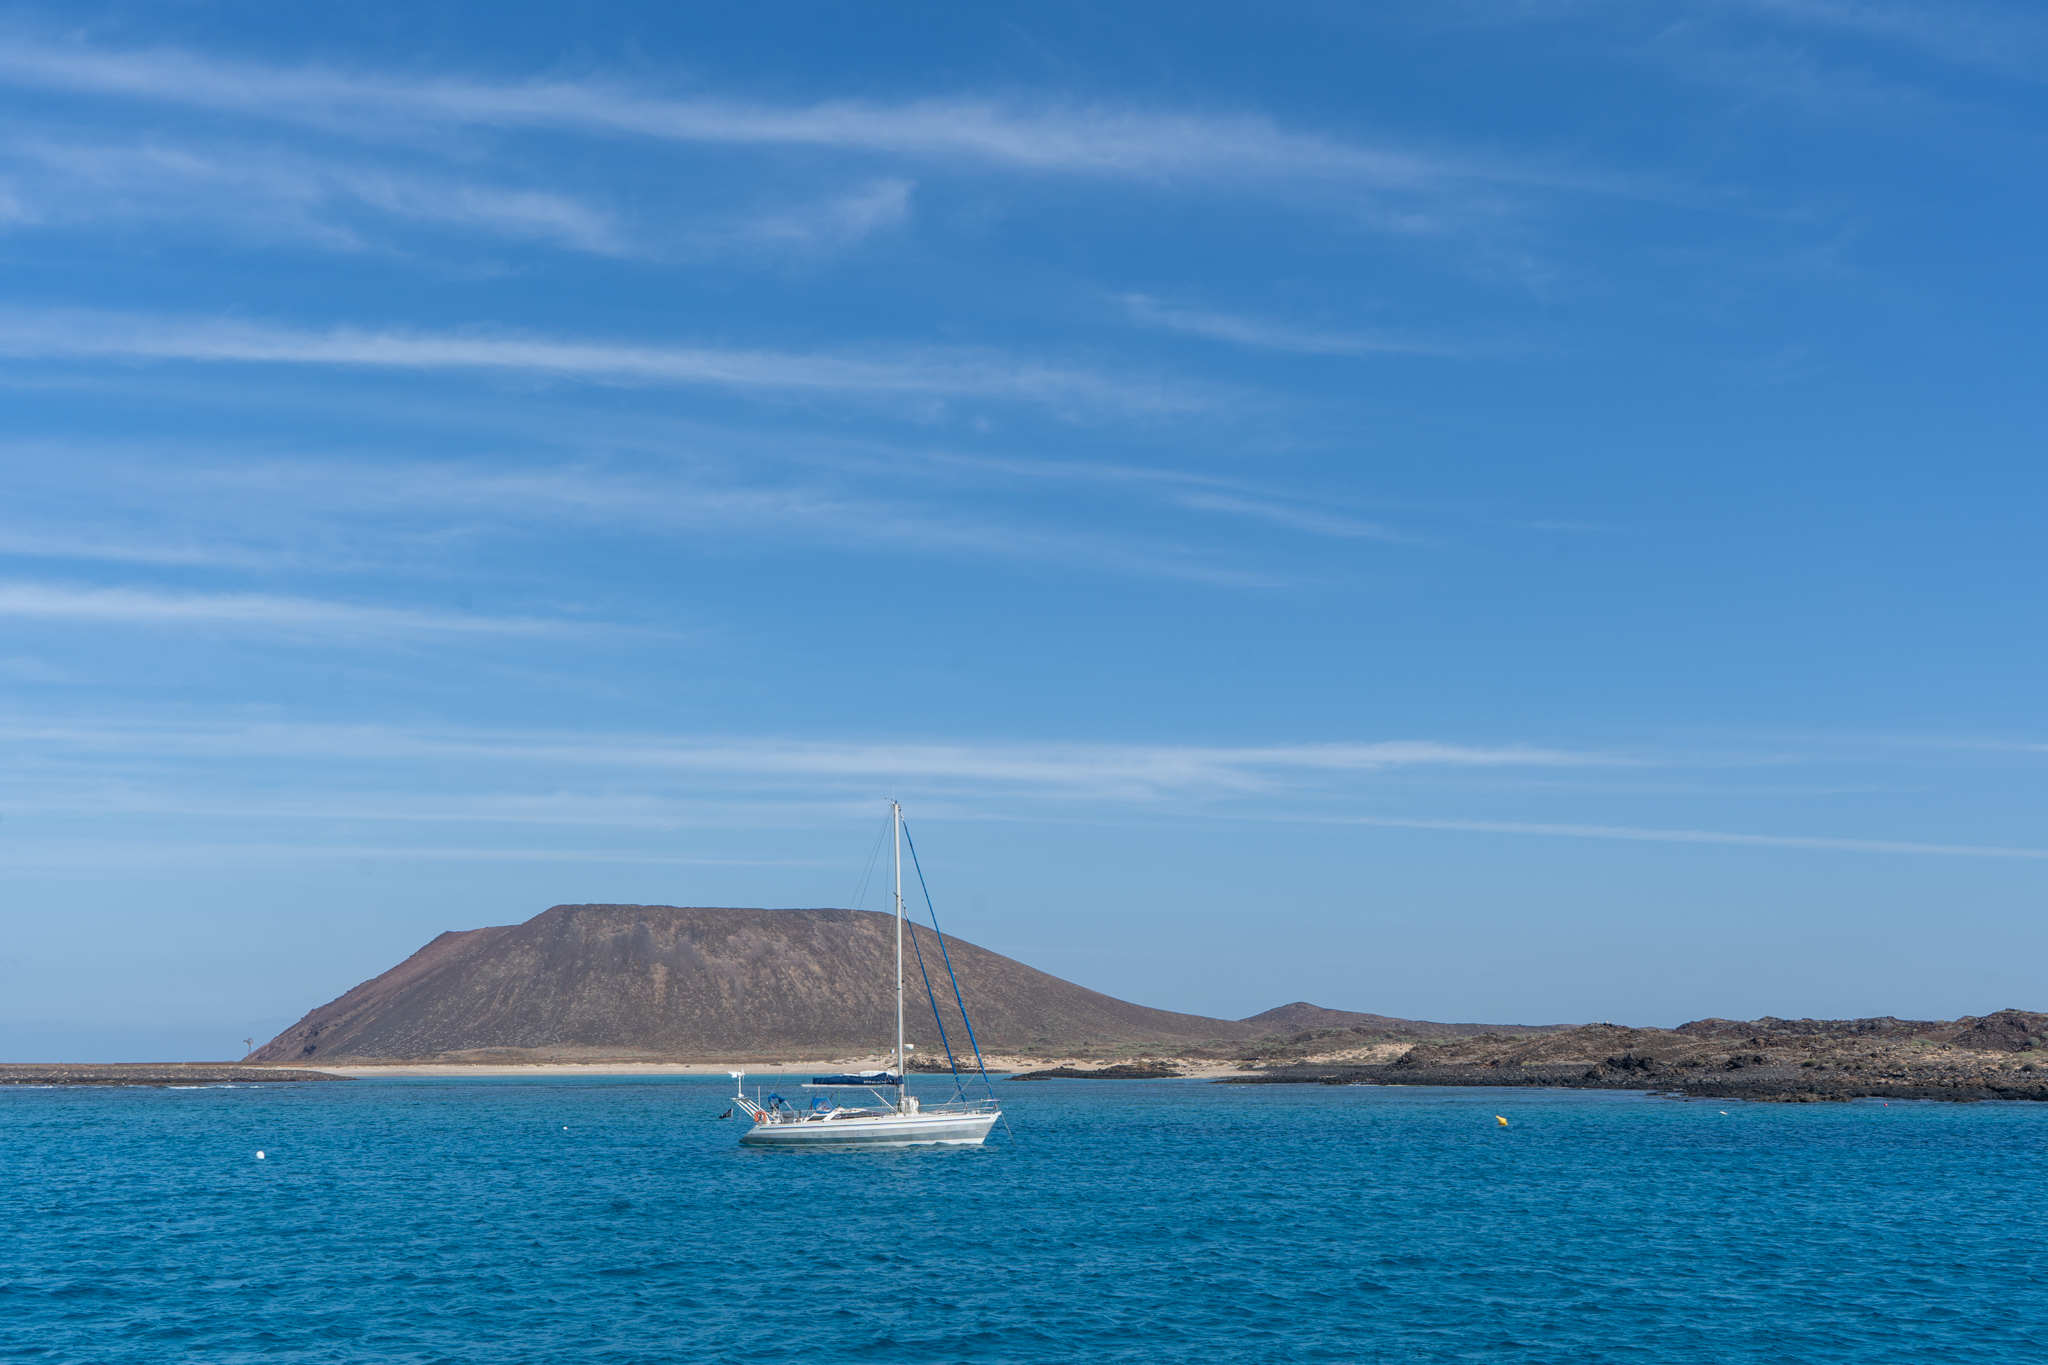 Ausblick auf die Isla de Lobos vor Fuerteventura